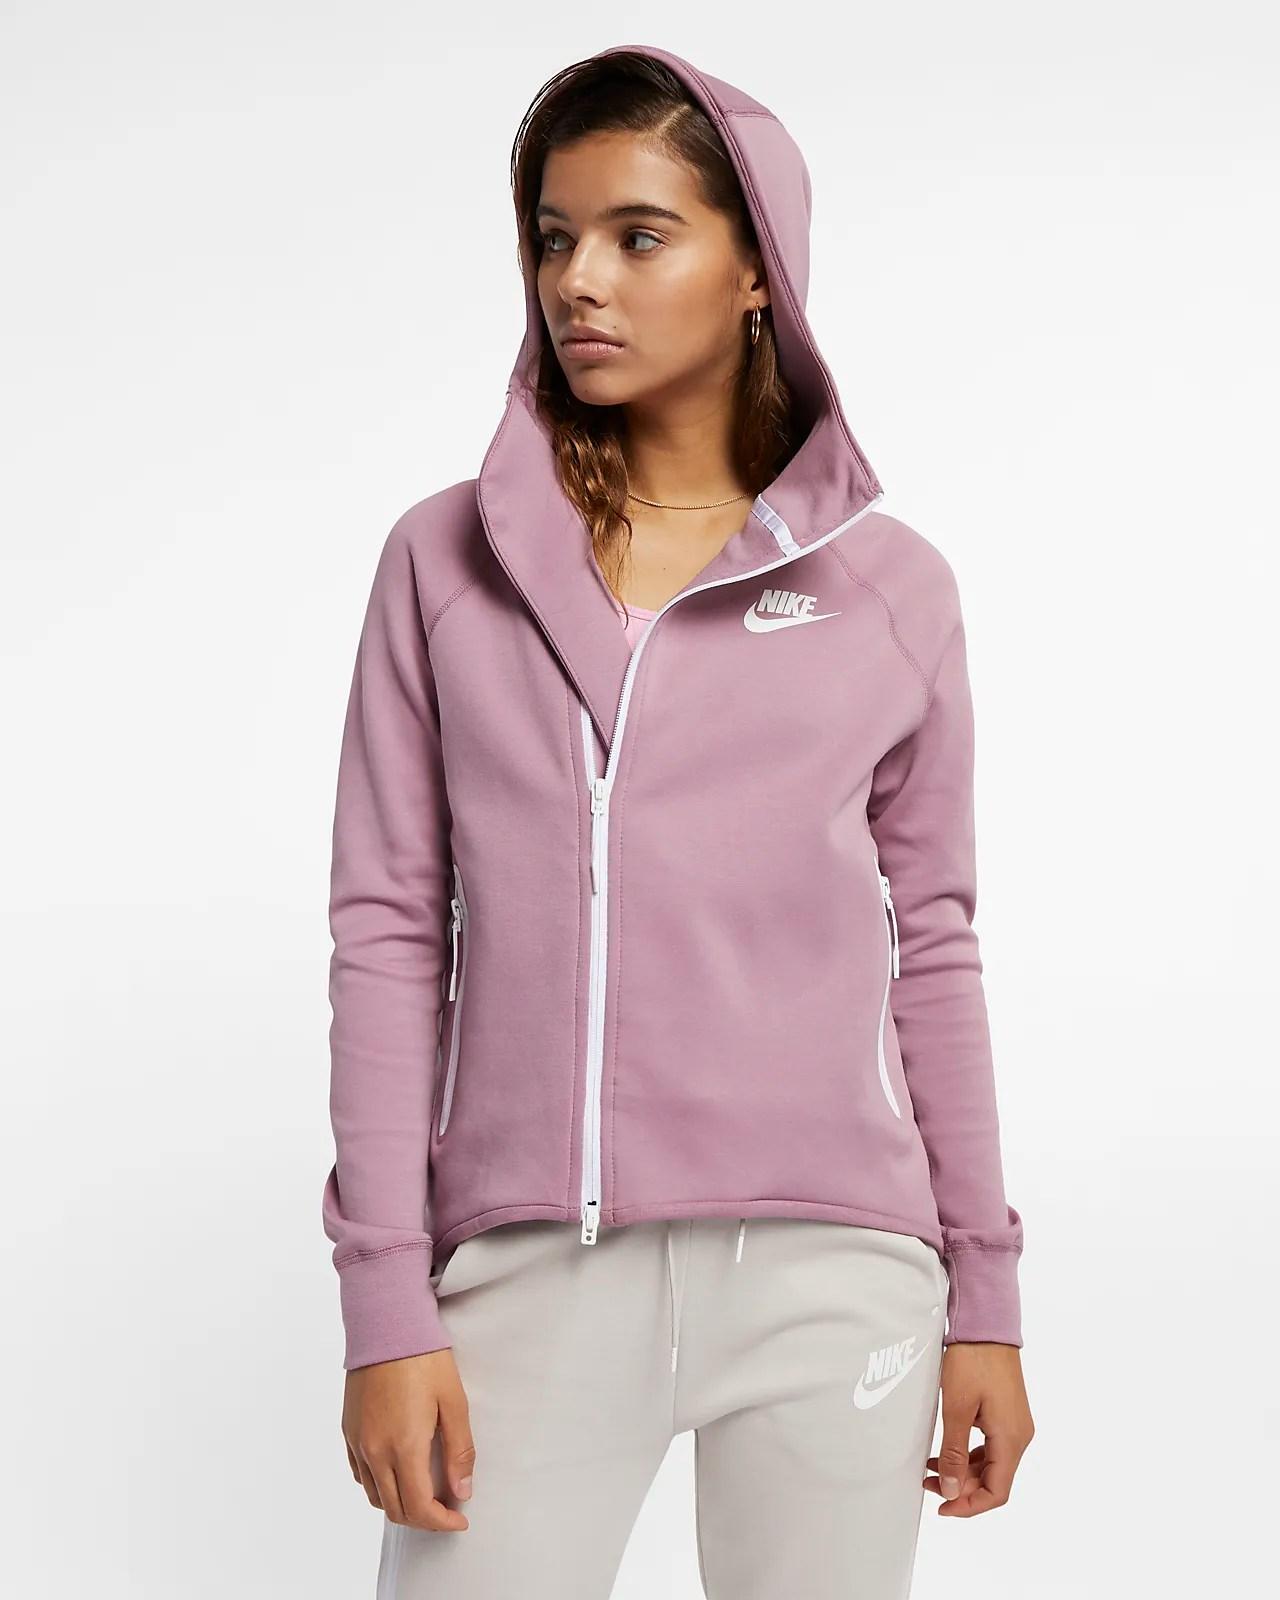 Nike Sportswear Tech Fleece 女子全長拉鏈開襟外套-耐克(Nike)中國官網